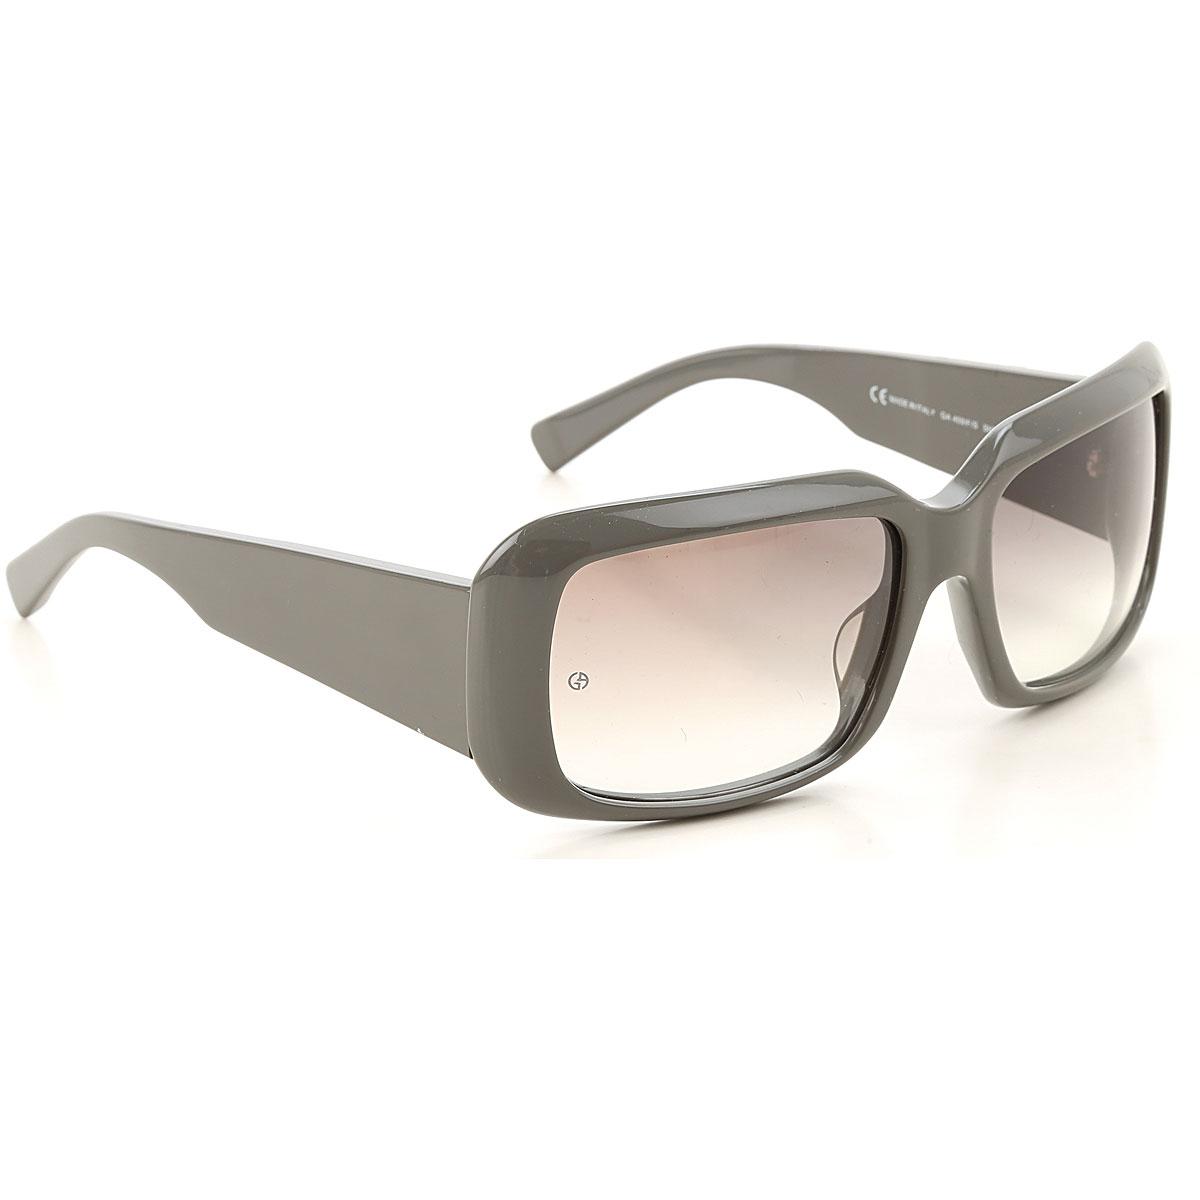 Giorgio Armani Sunglasses On Sale, Grey, 2019